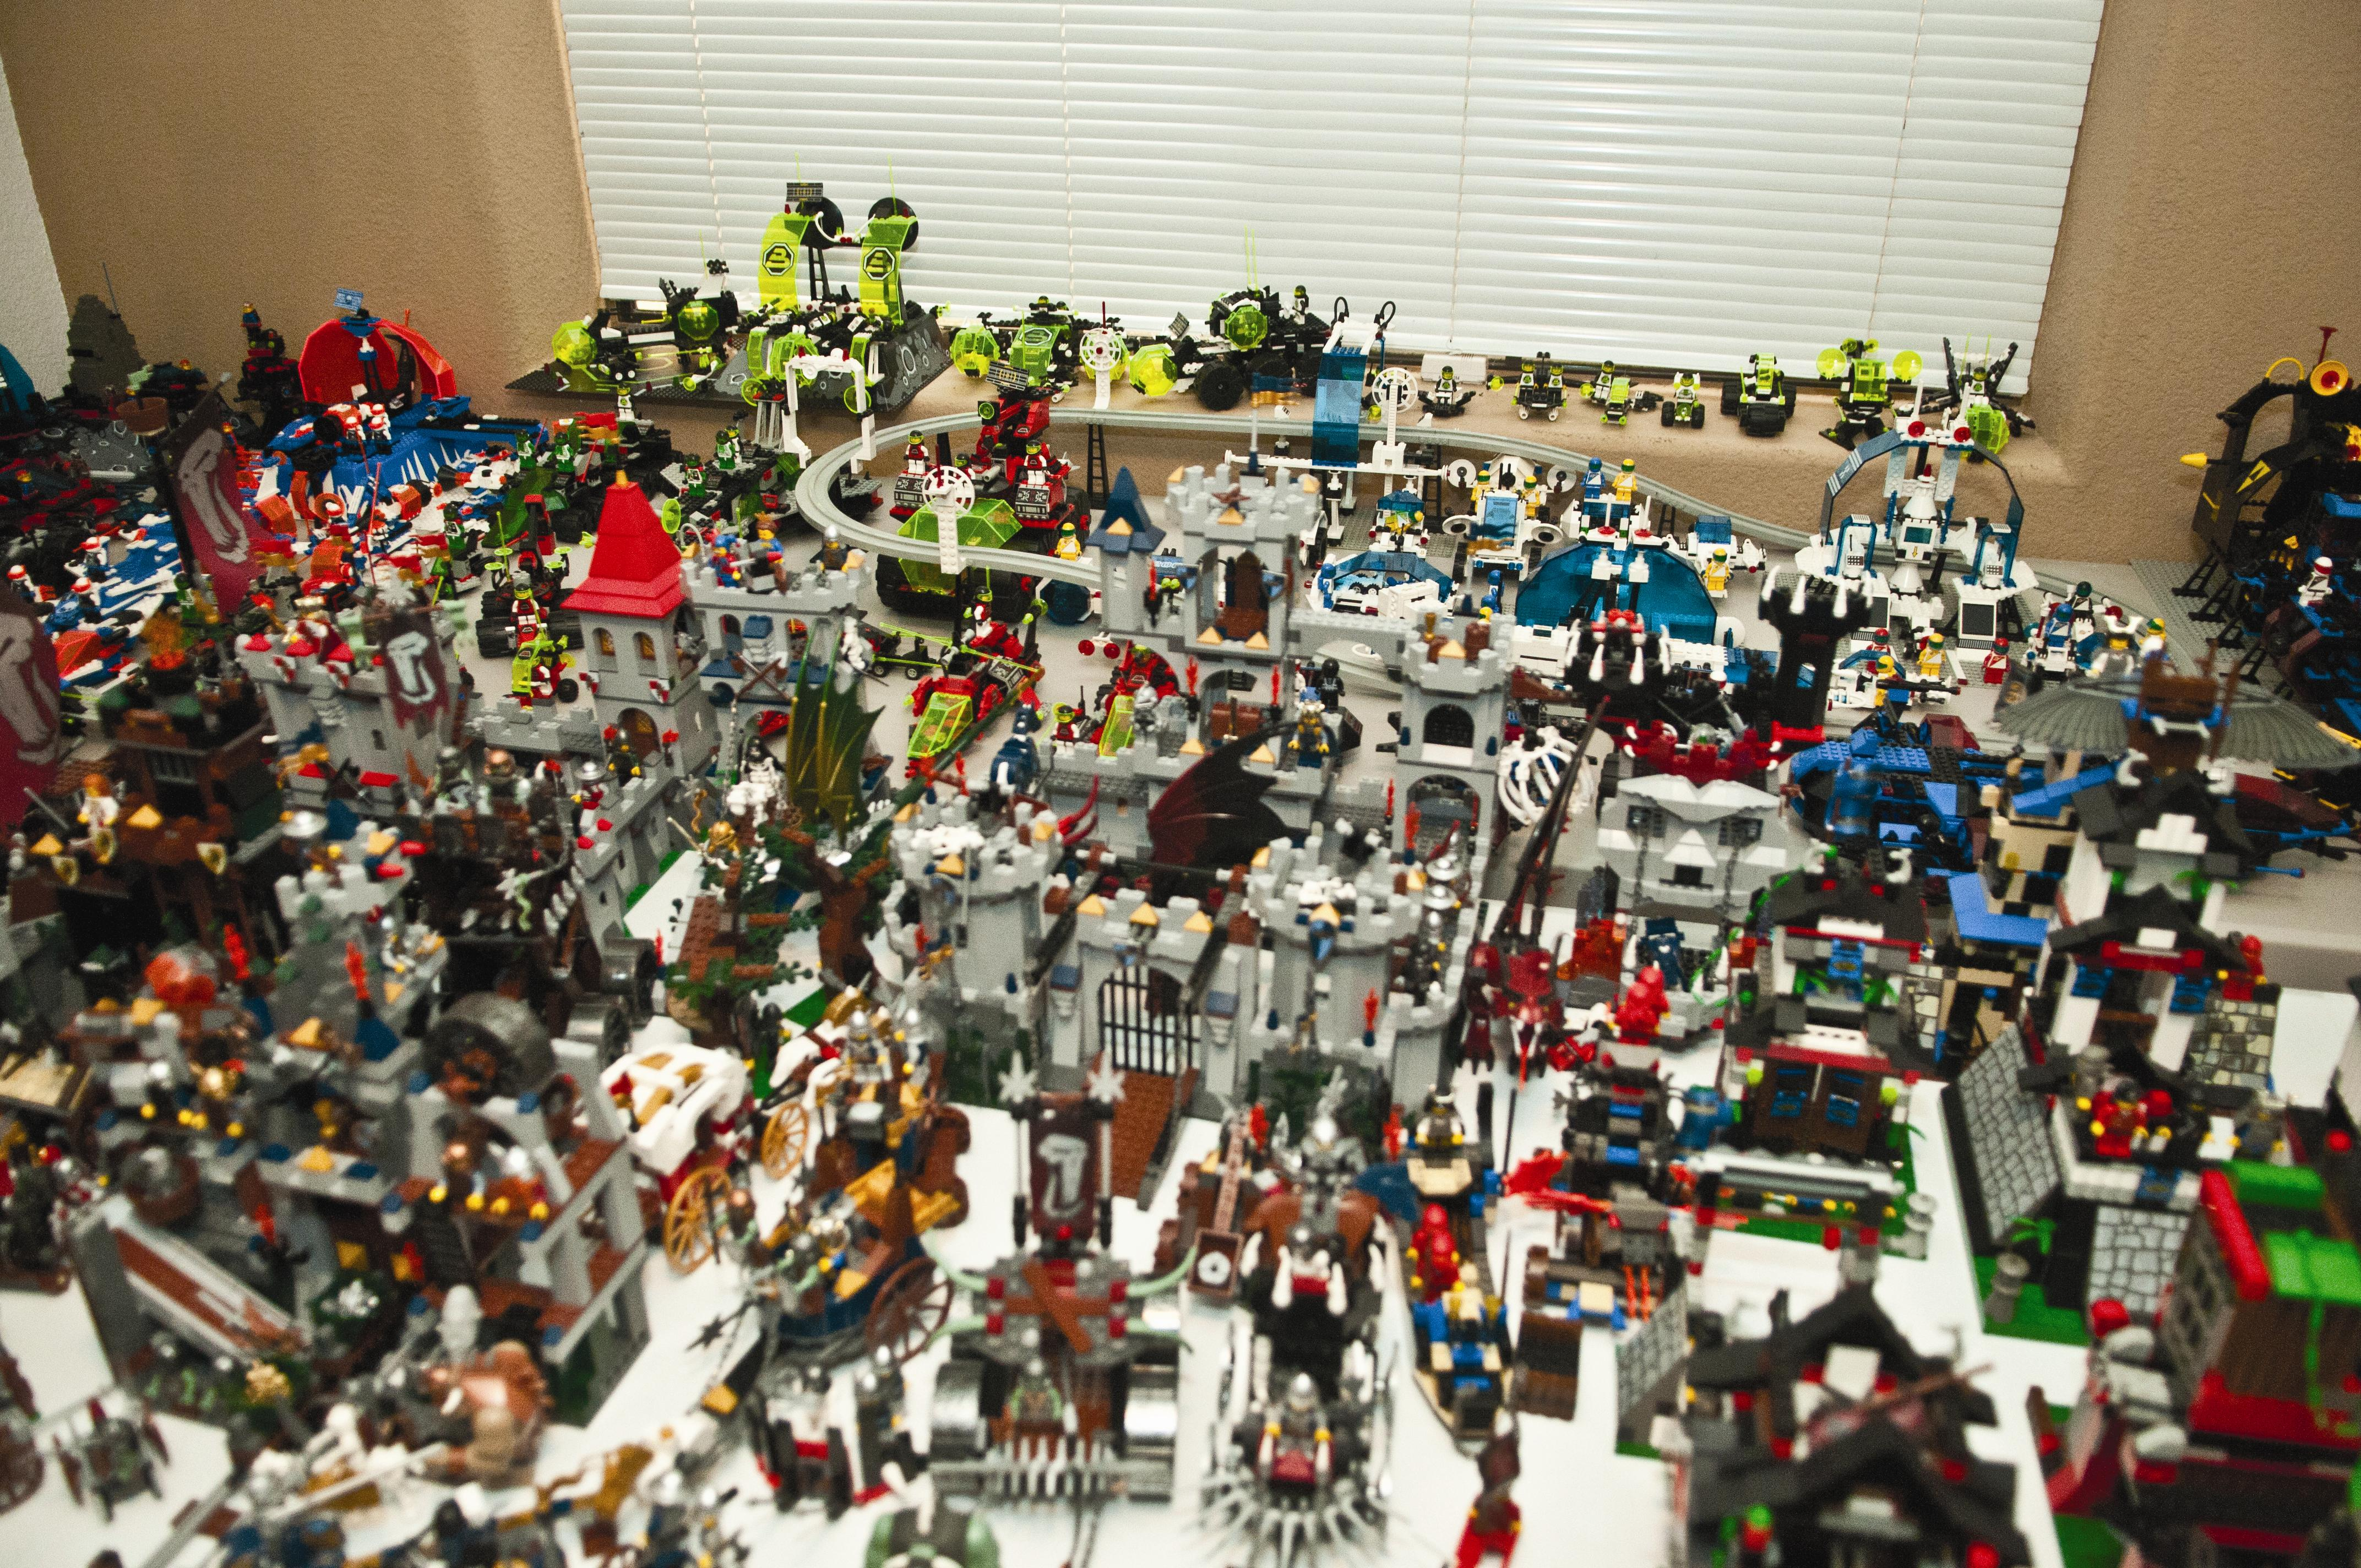 Marine sets Lego world record > Marine Corps Air Station